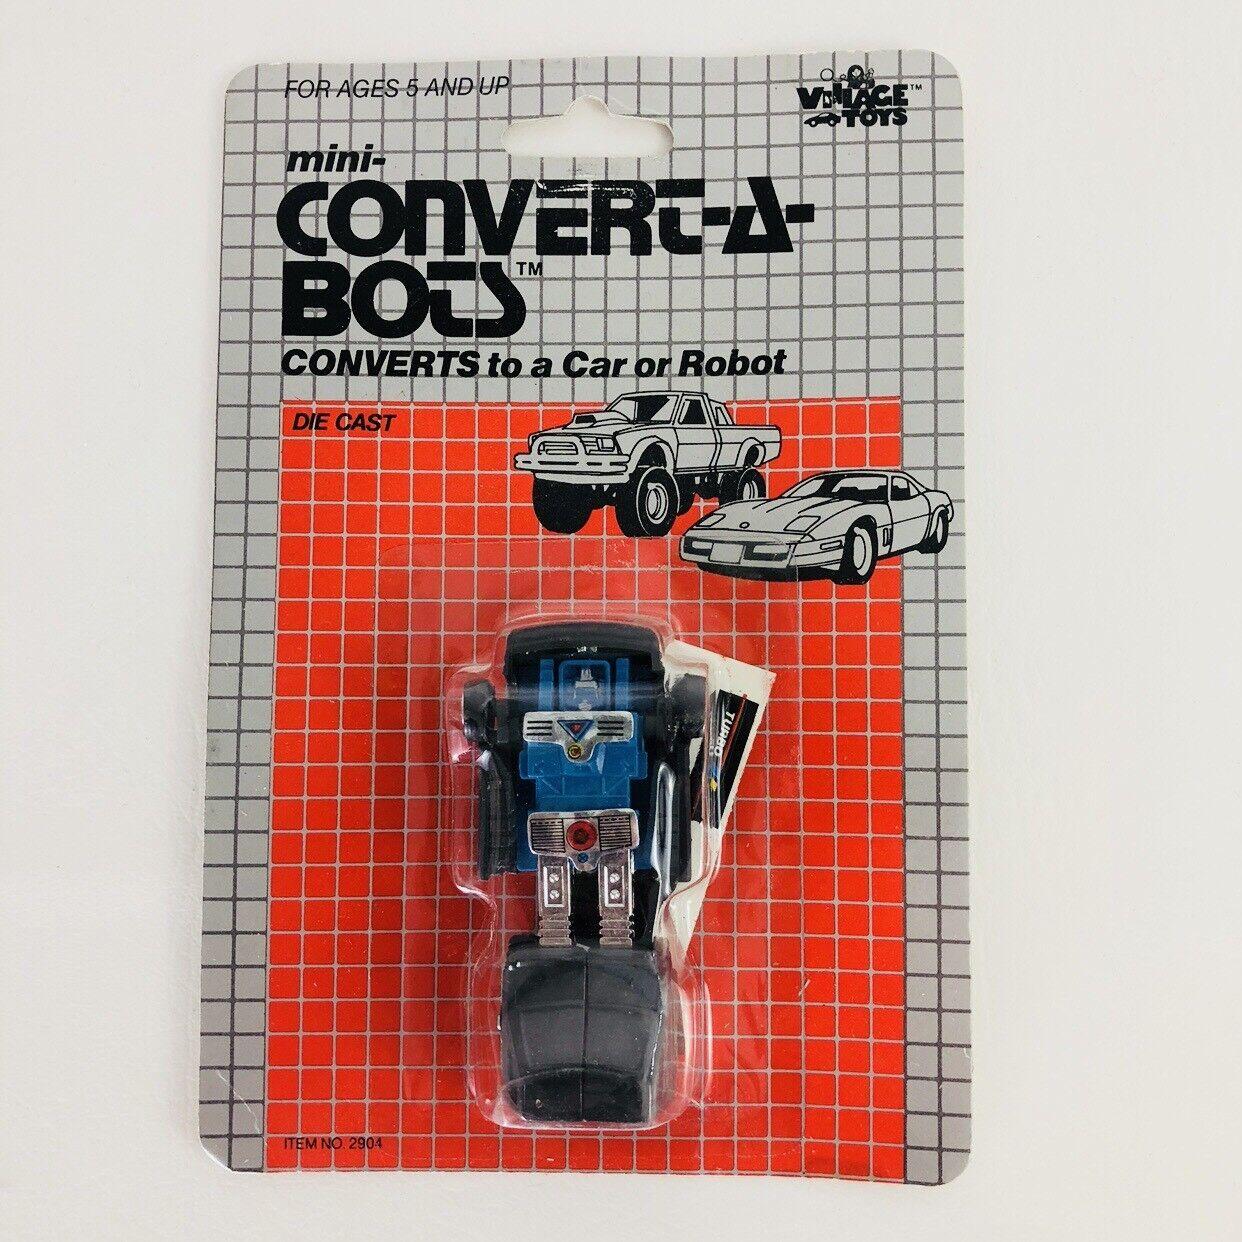 Vtg 1983 Village Toys Congreen A Bot Toy Robot On Card Purple Sedan